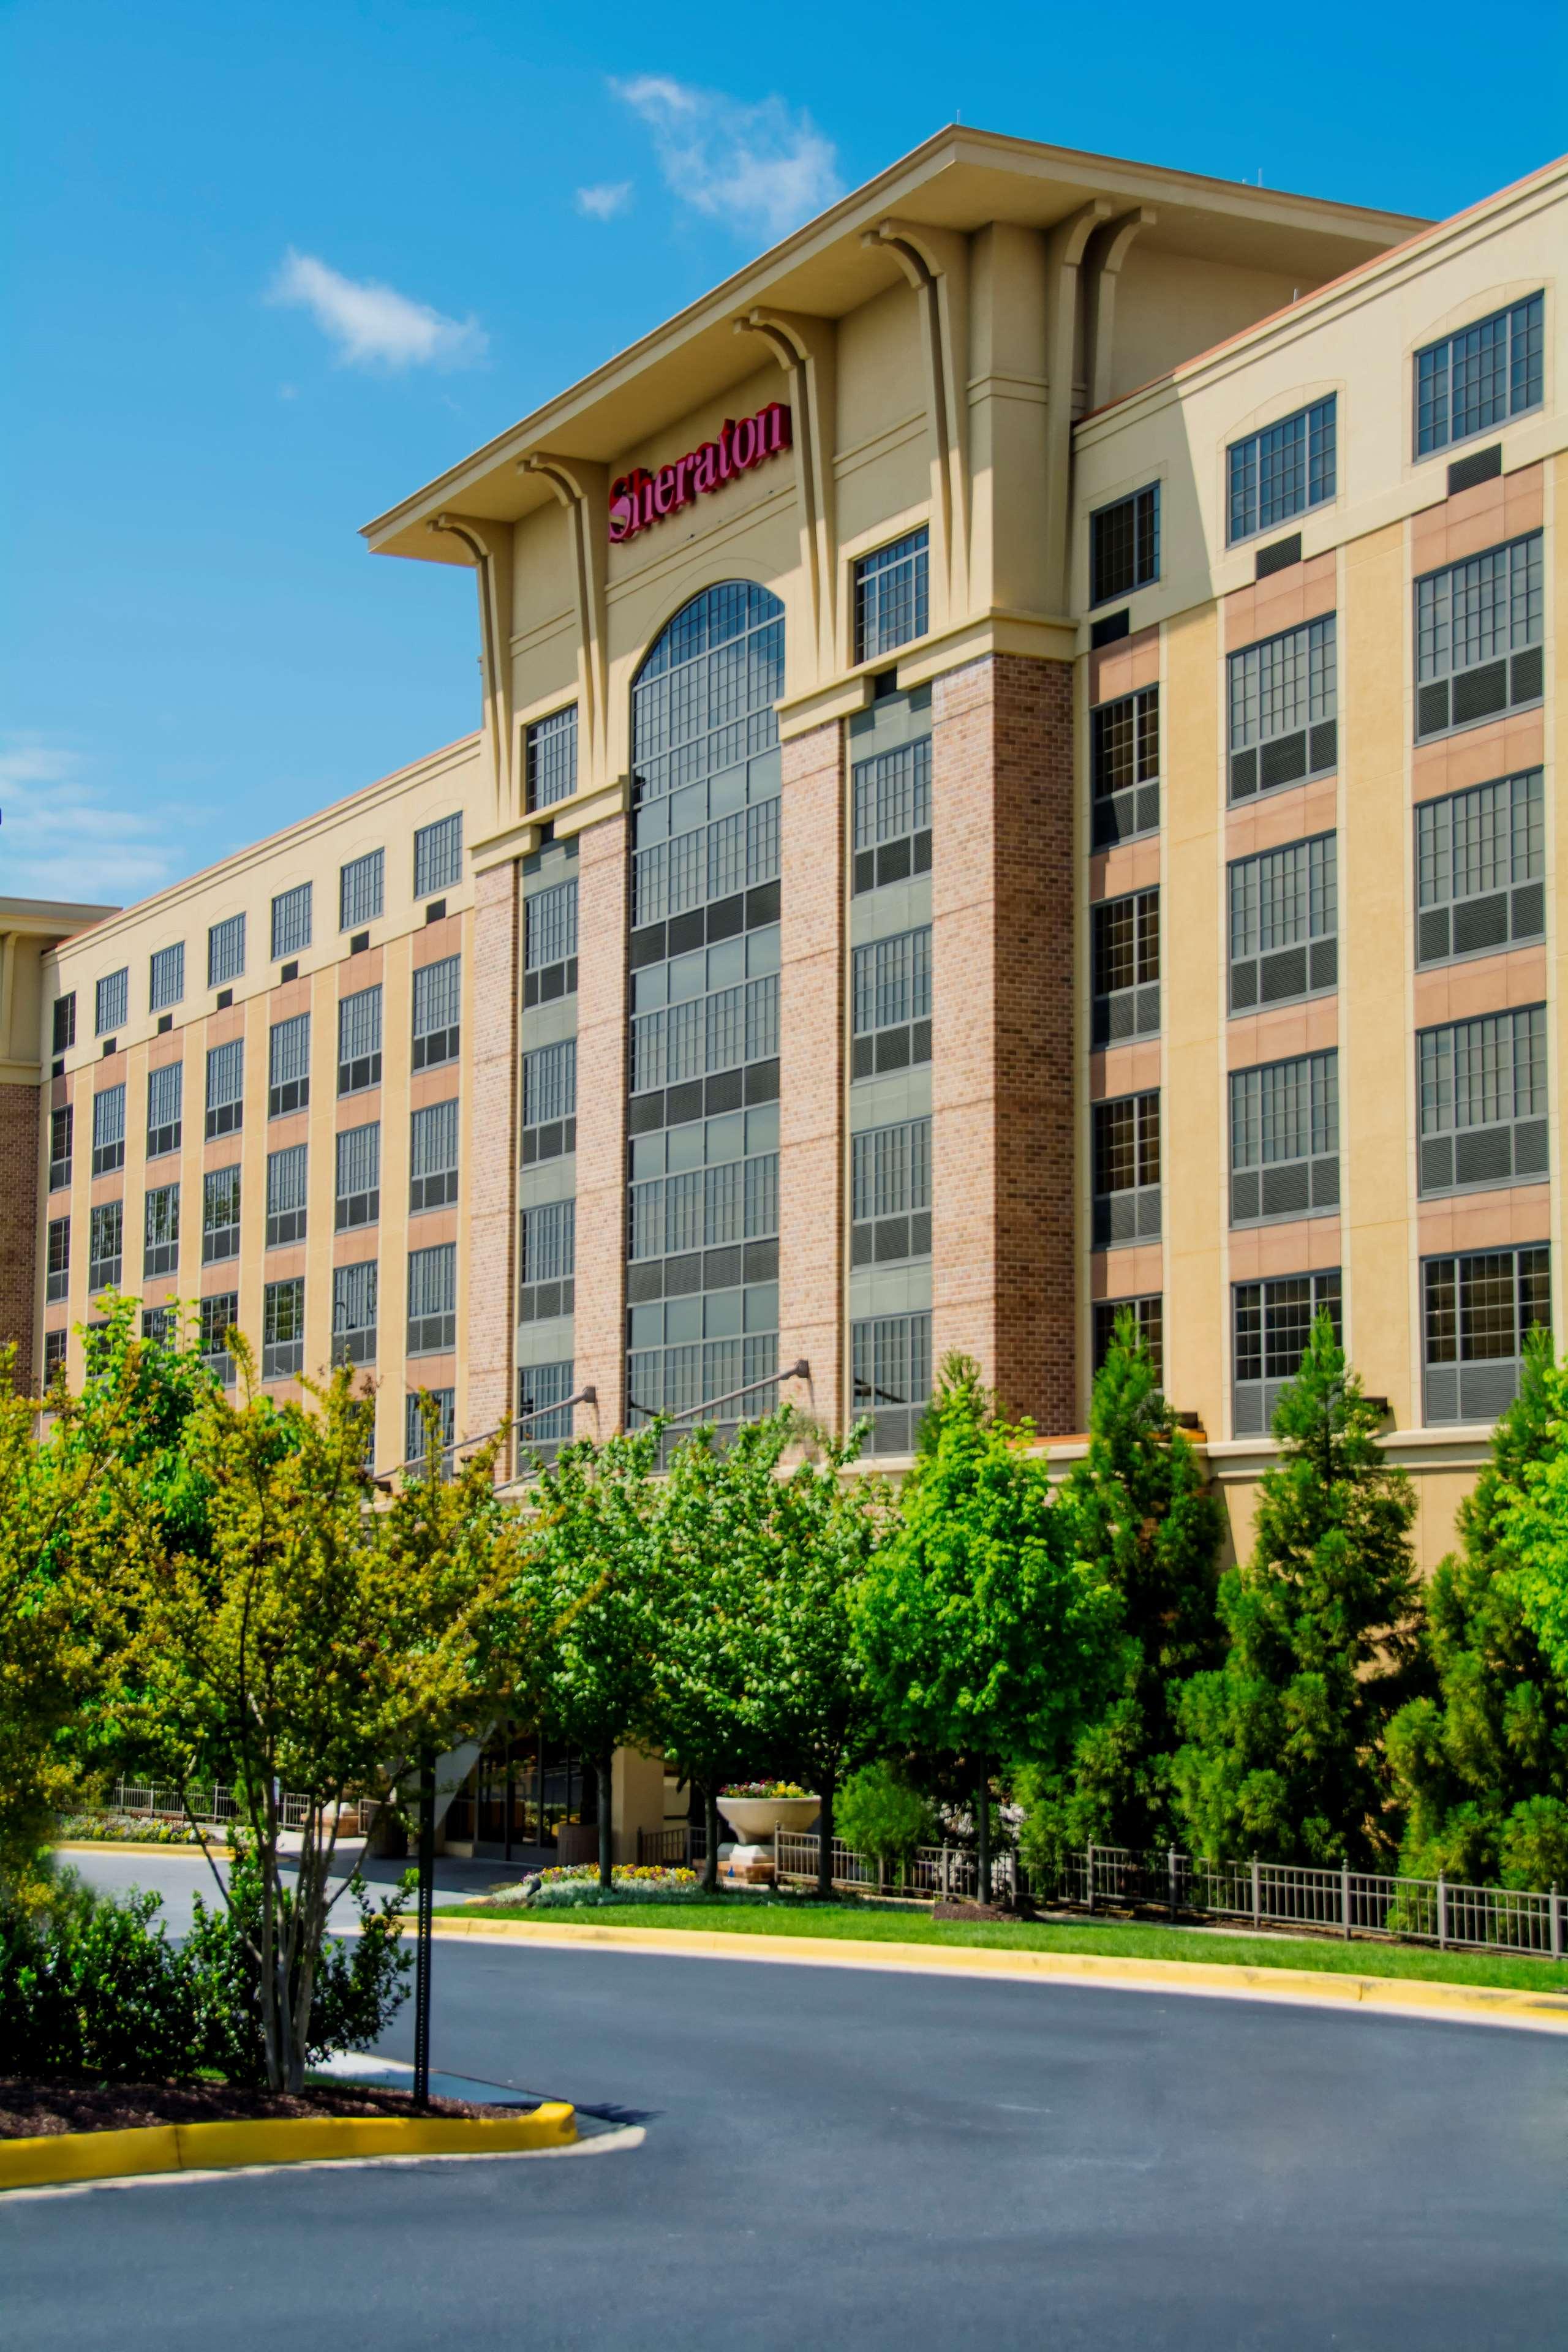 Sheraton Baltimore Washington Airport Hotel Bwi 1100